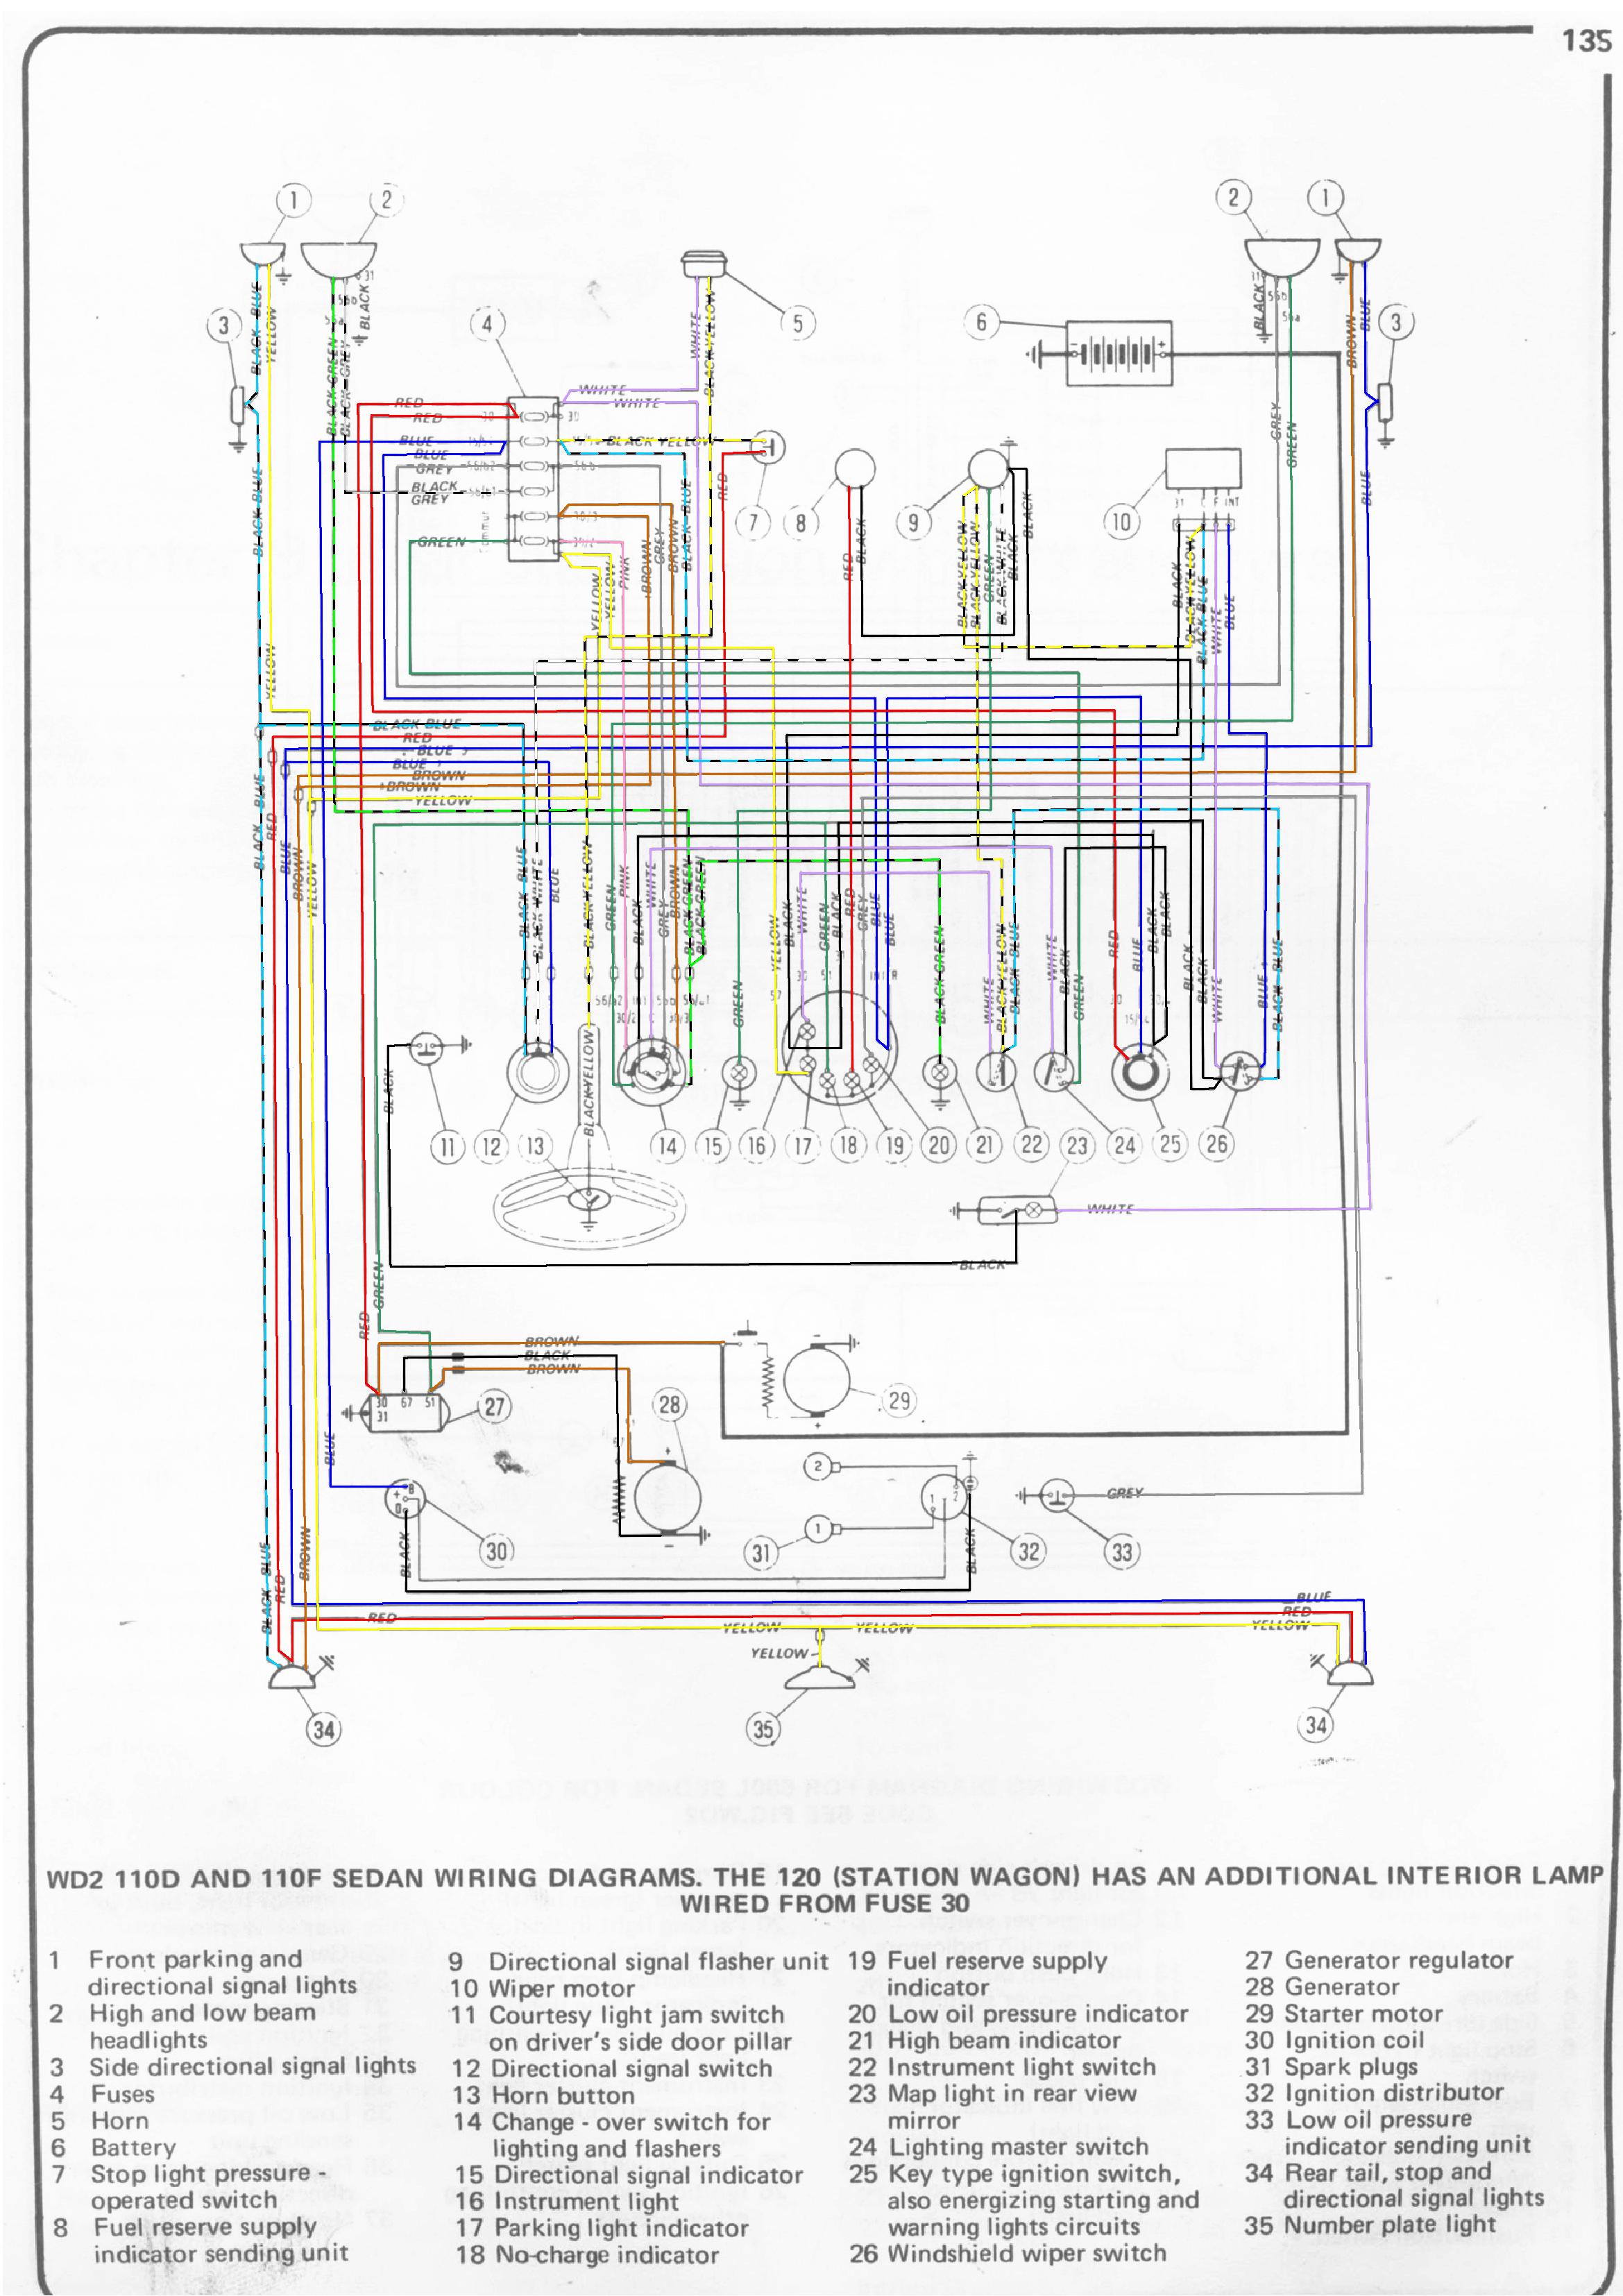 medium resolution of fiat 600 tractor wiring diagram 24h schemesfiat spider 124 wiring diagram fiat 124 parts wiring